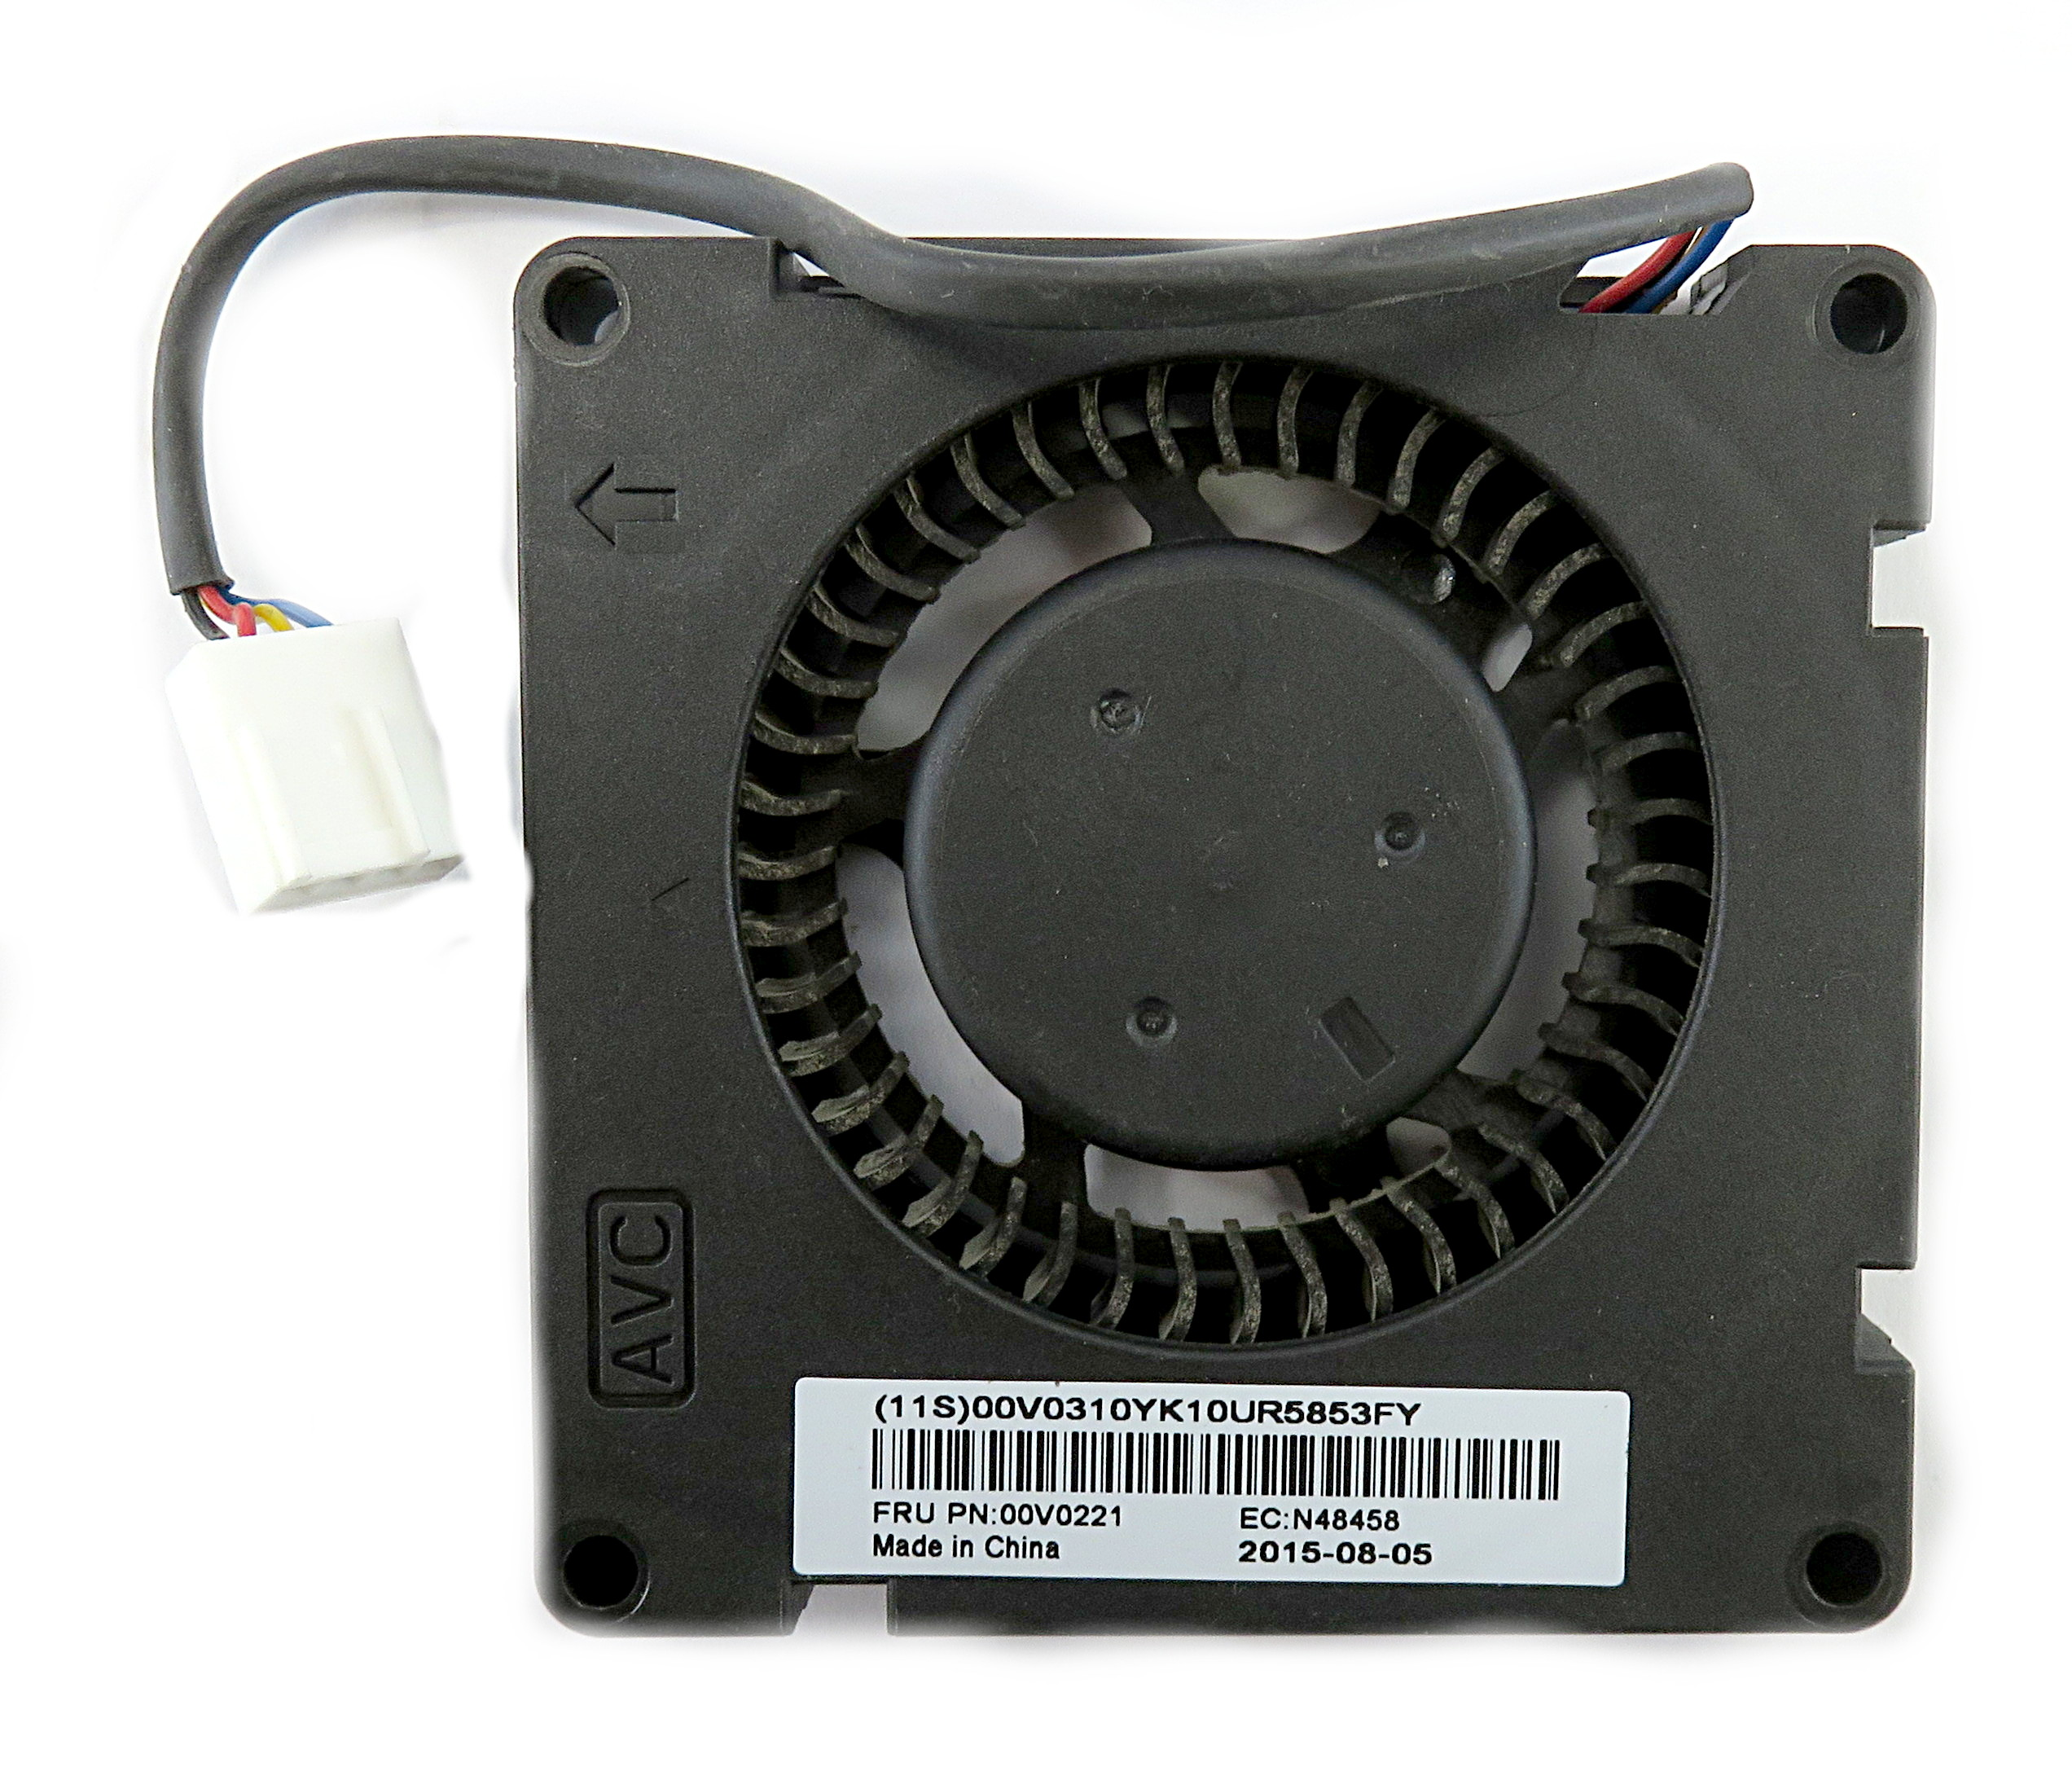 Lenovo 00V0221 Co0ling Fan f/ Toshiba TCxWave 6140-E3R EPOS Terminal